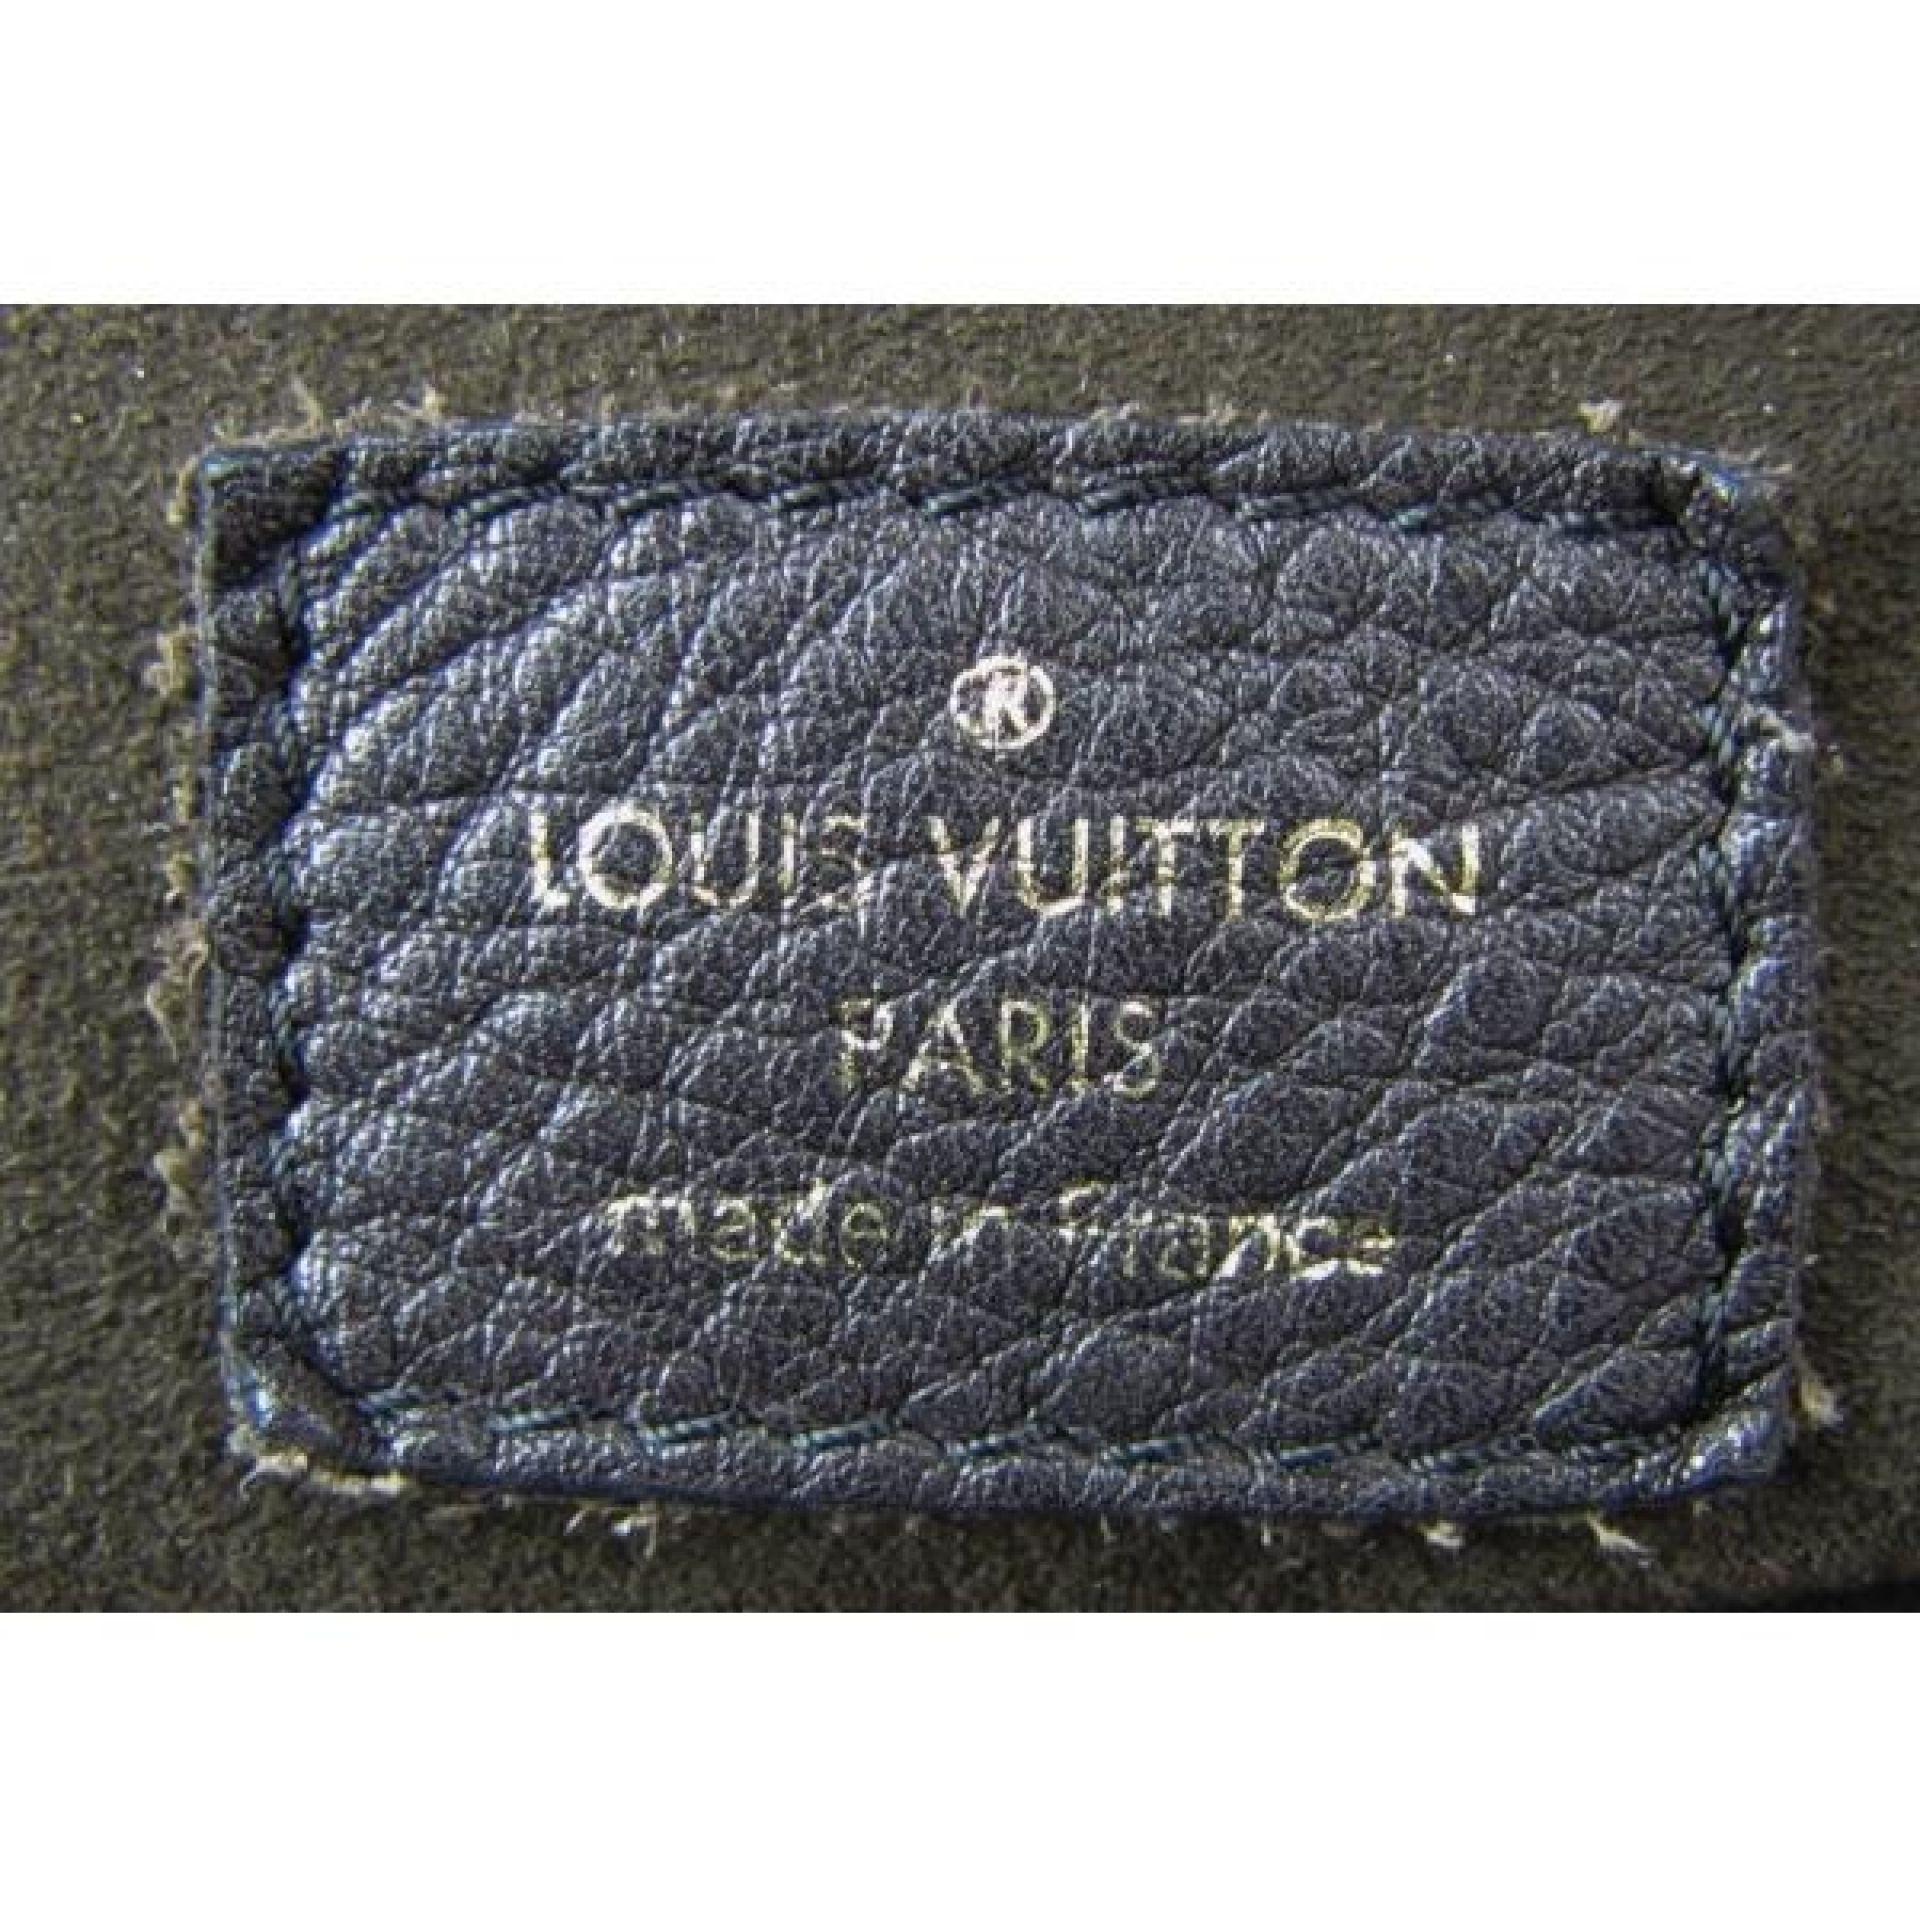 Louis Vuitton Brown Perforated Mahina Leather Lunar GM Shoulder Bag